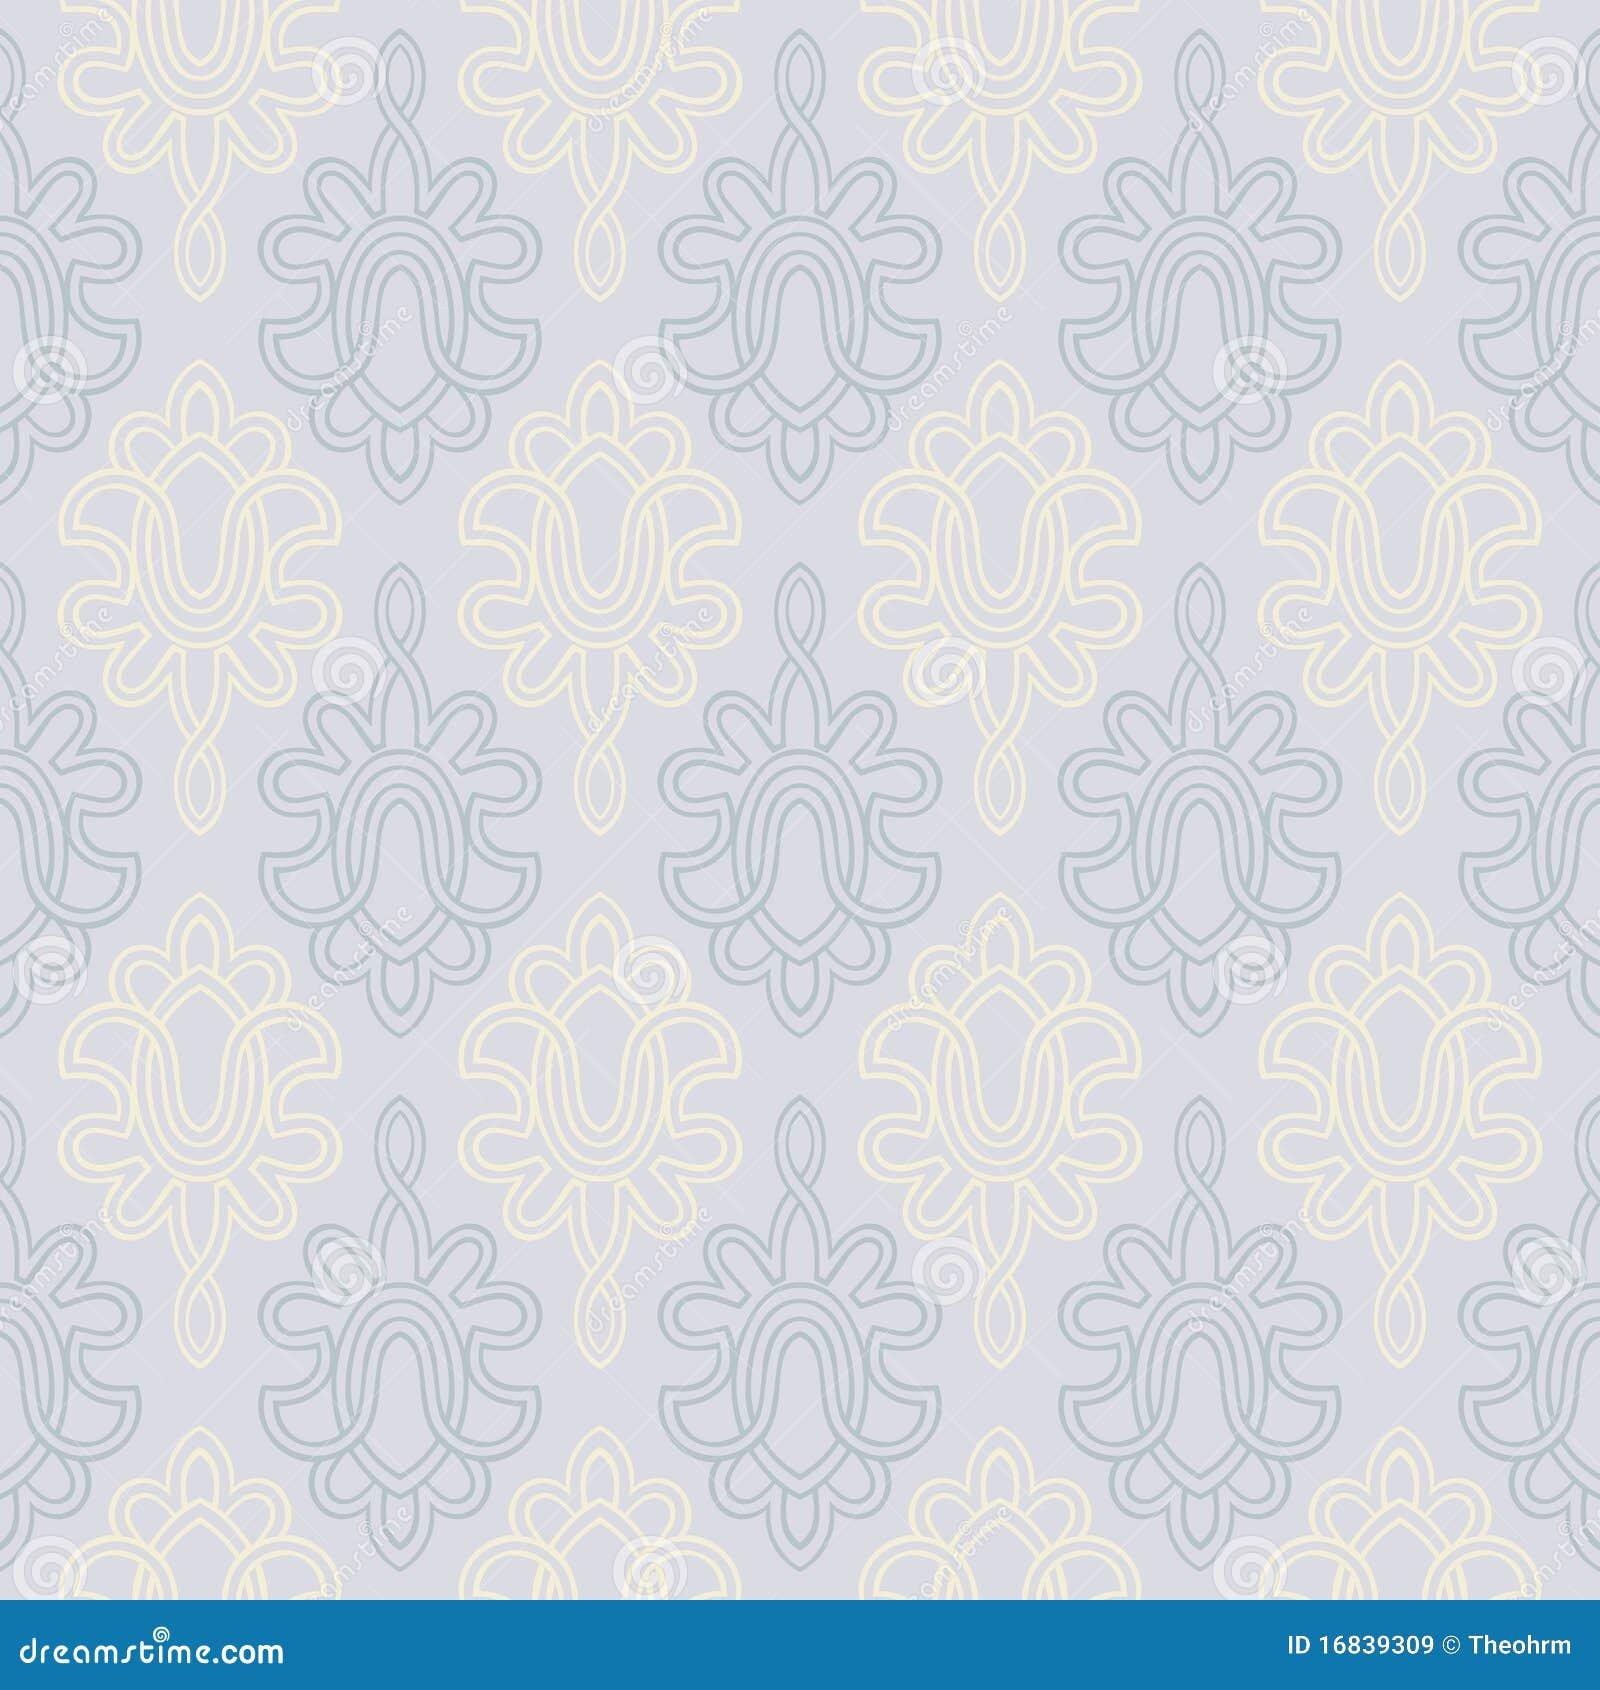 victorian wallpaper seamless - photo #37